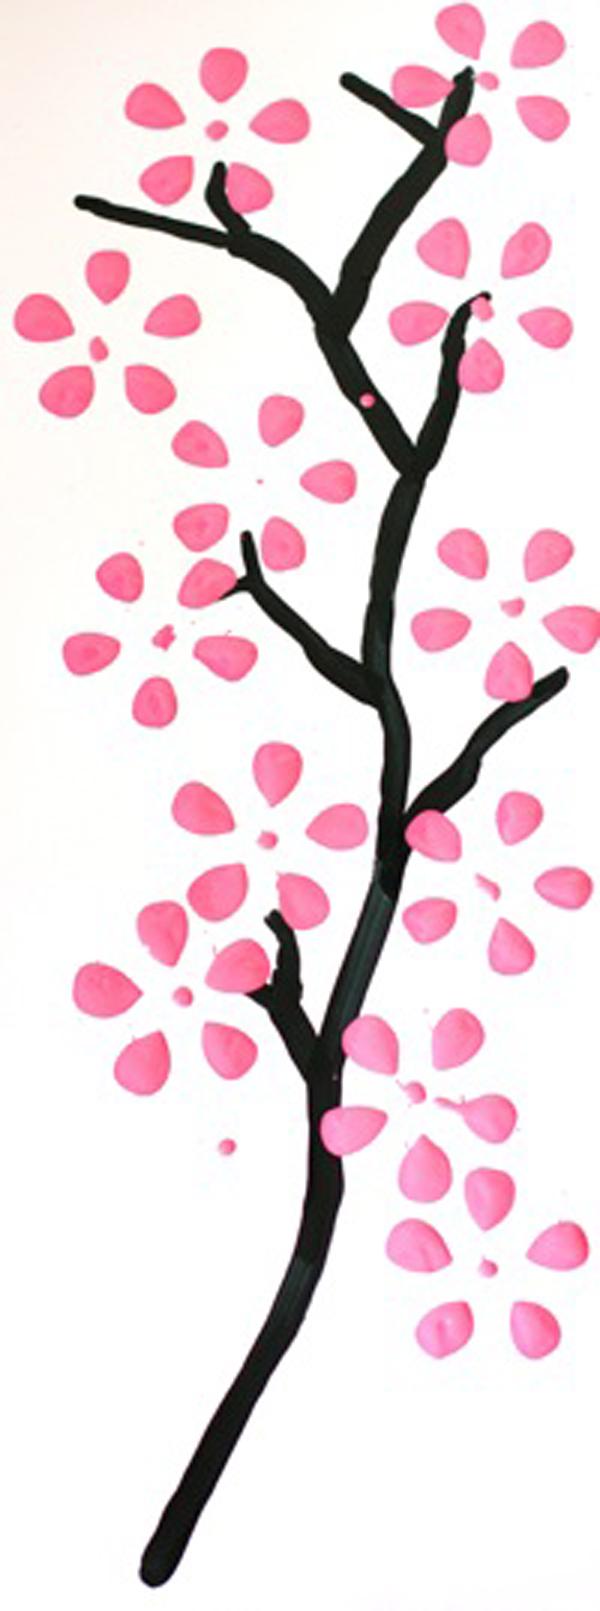 cherry-blossom-art-final.jpg